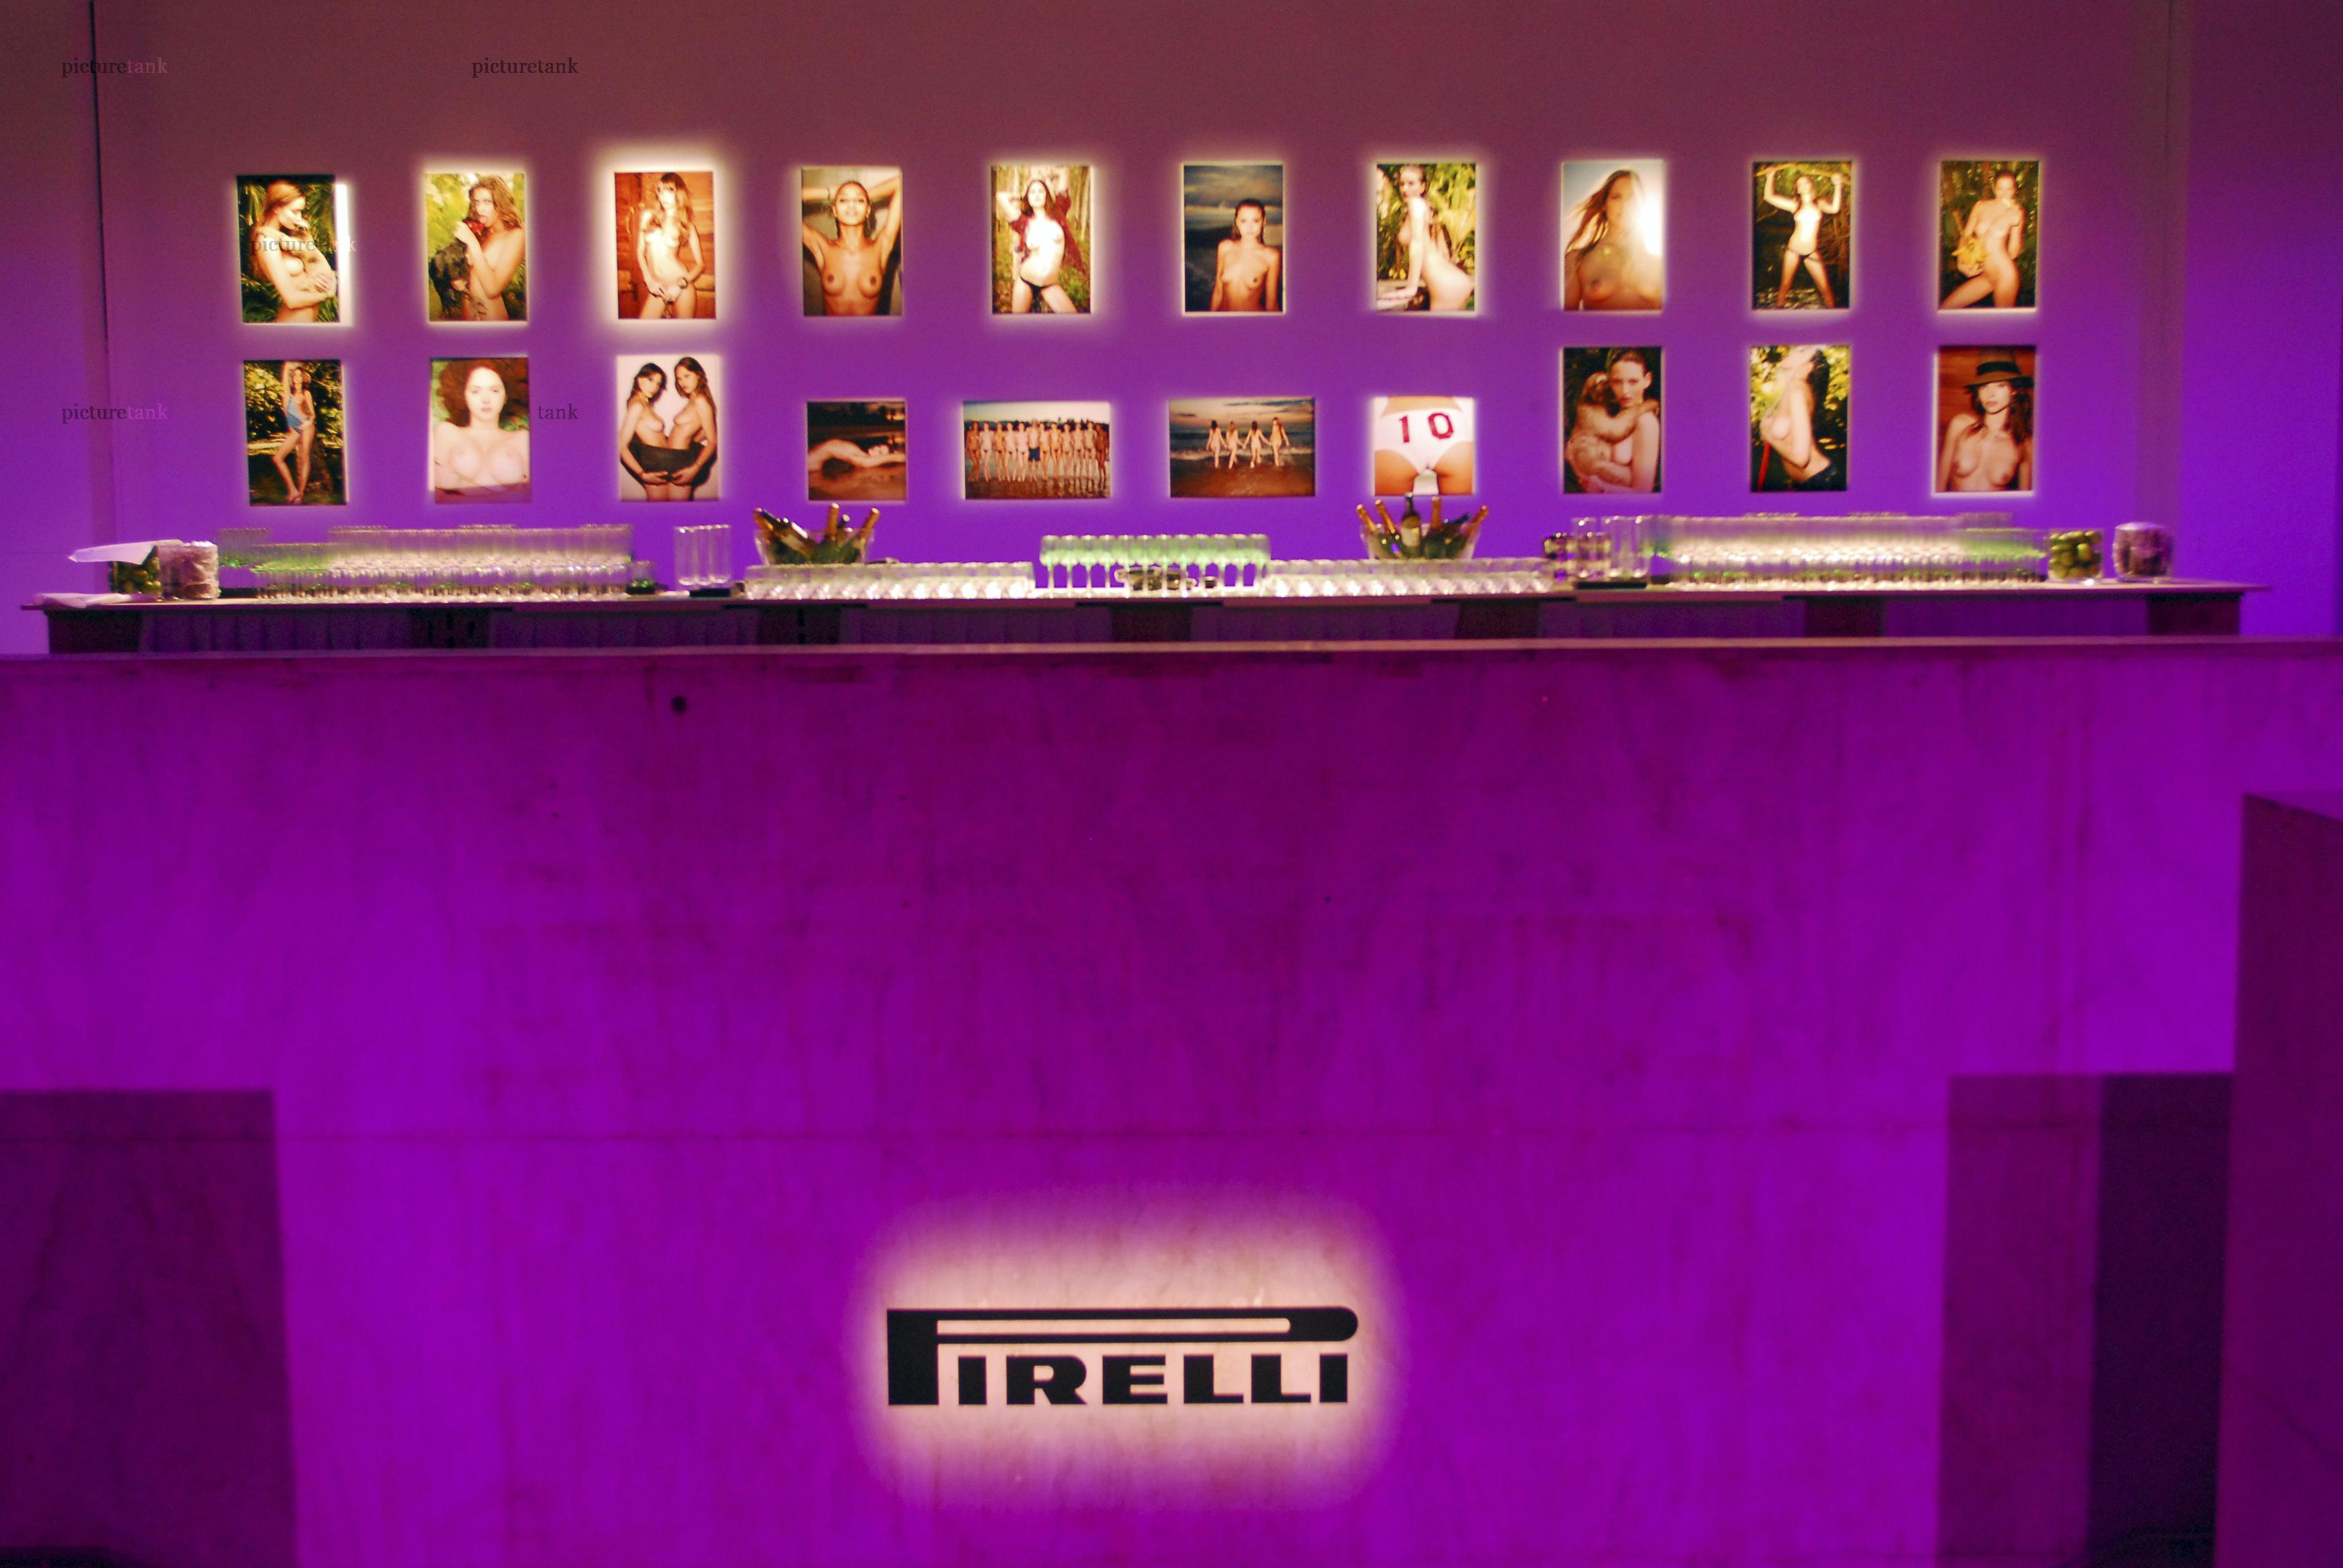 Pirelli France